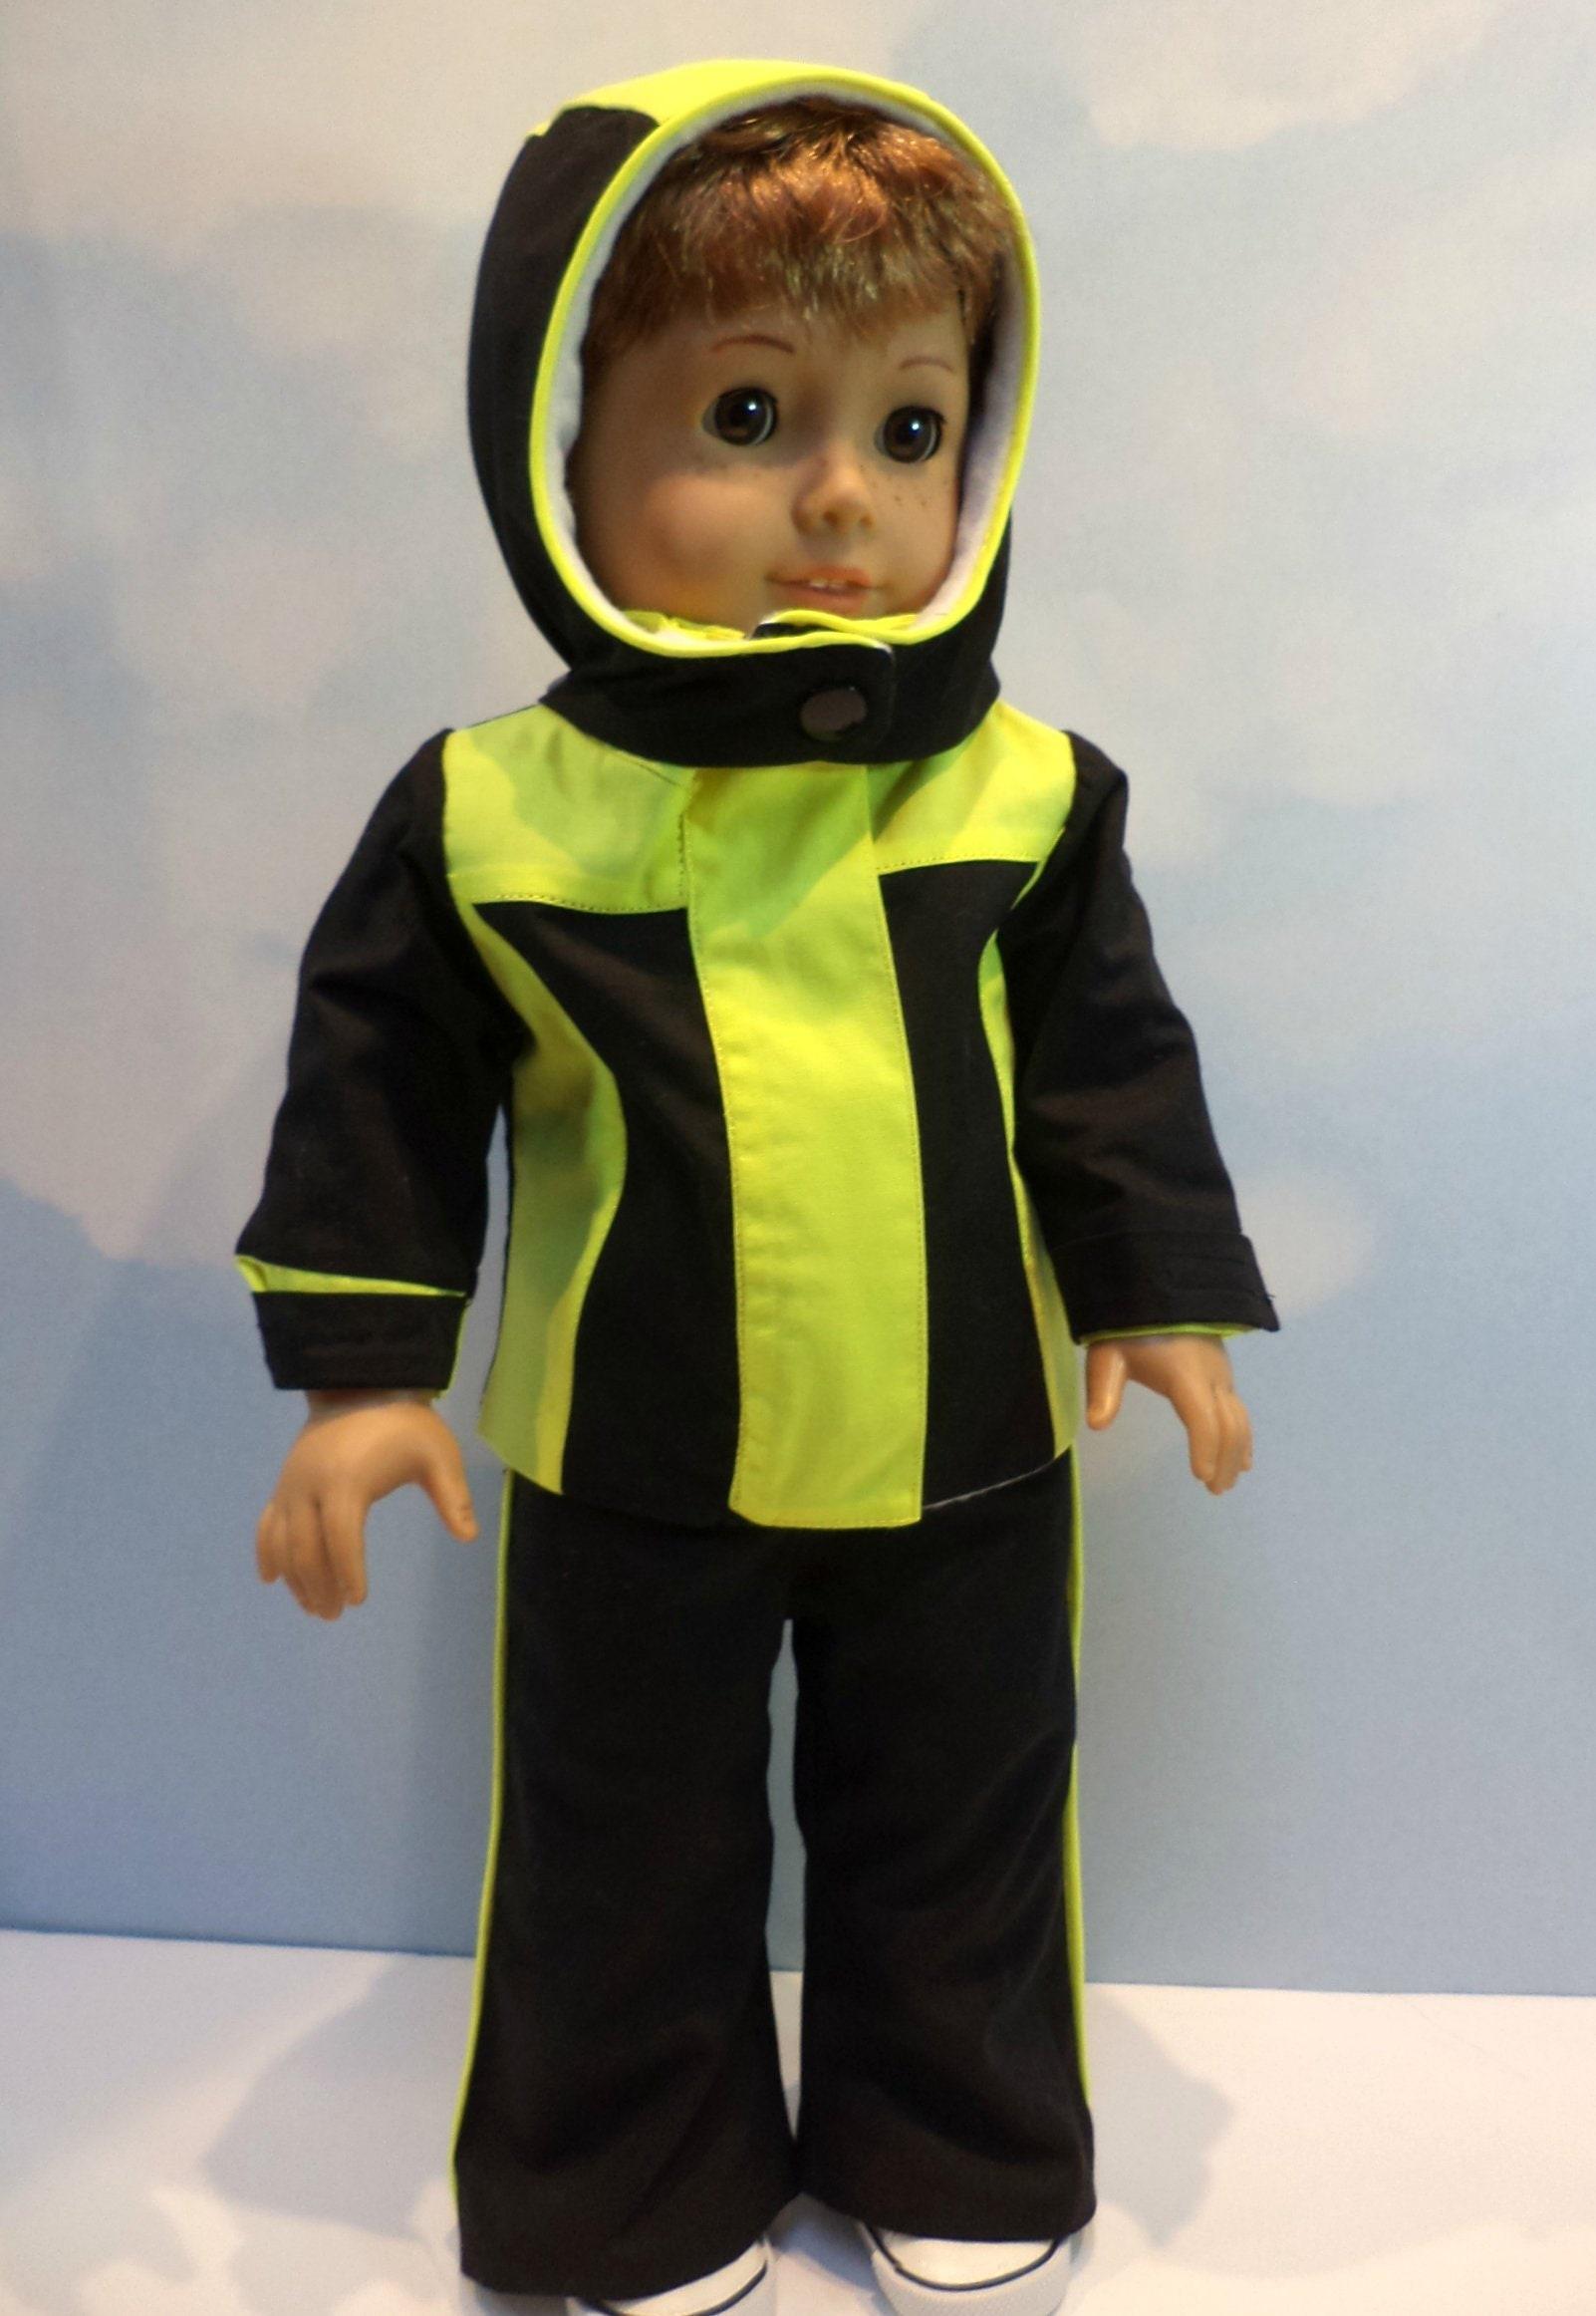 e36b82e34c7f 3 Piece Ski Snow Suit for 18 Inch Boy Dolls Such as American